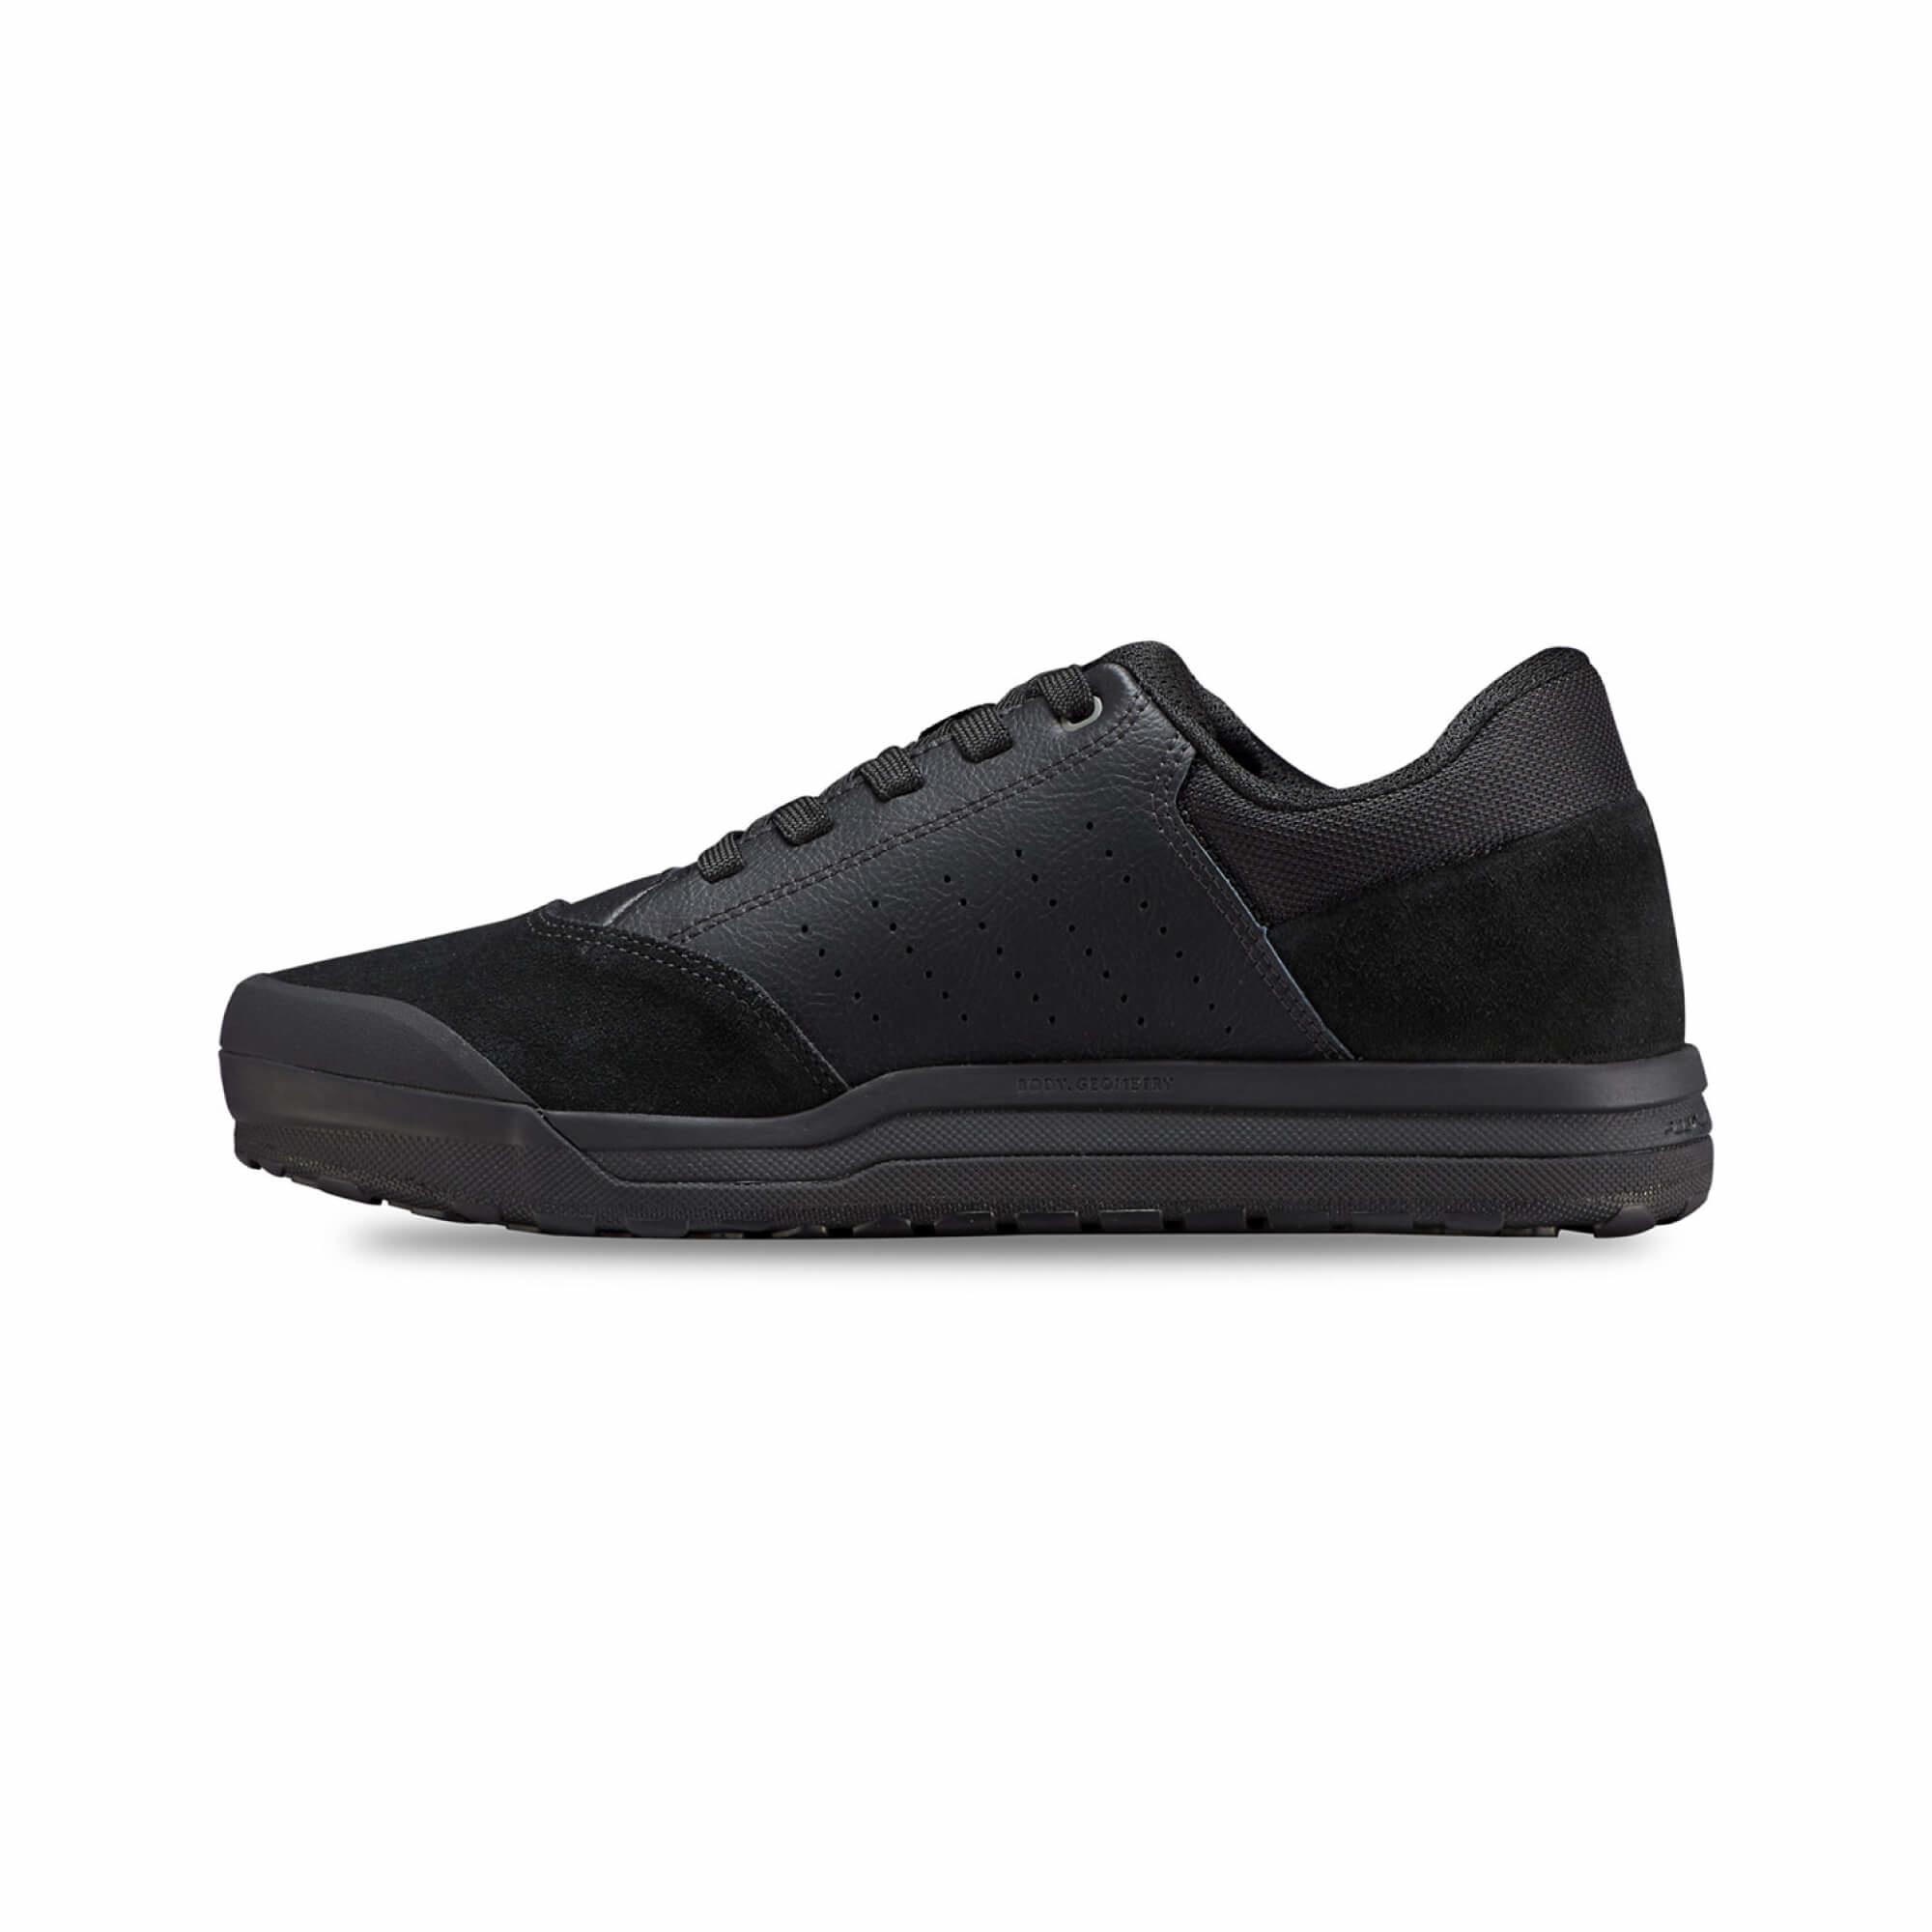 2FO Roost Flat MTB Shoe-3